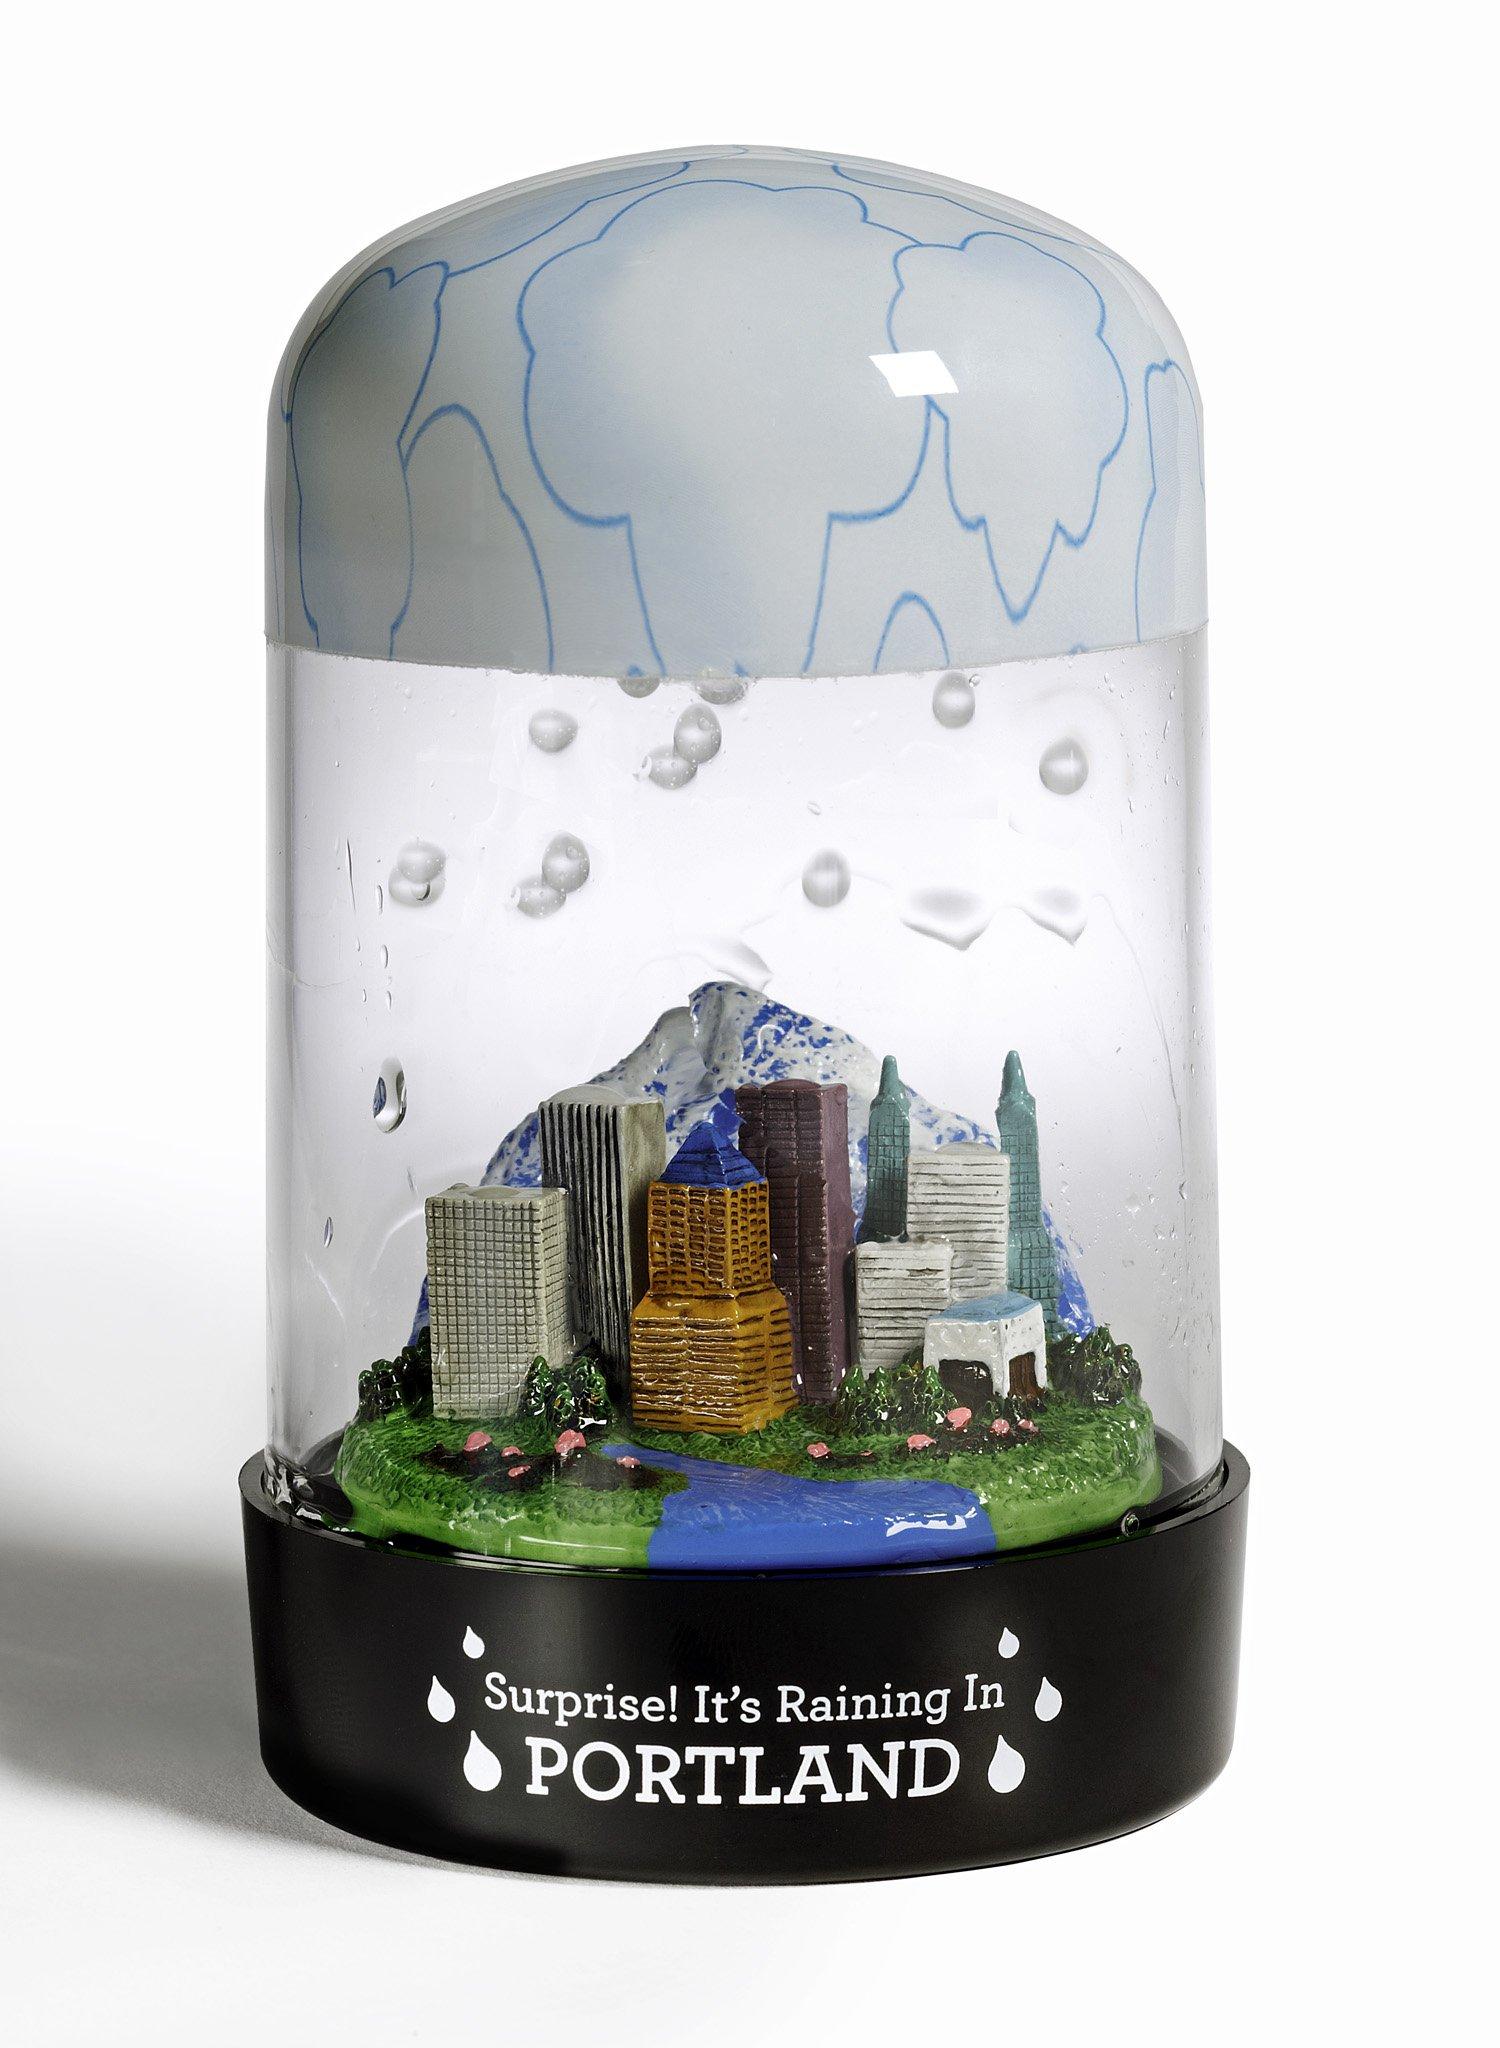 Portland RainGlobe - The Globe That Rains!